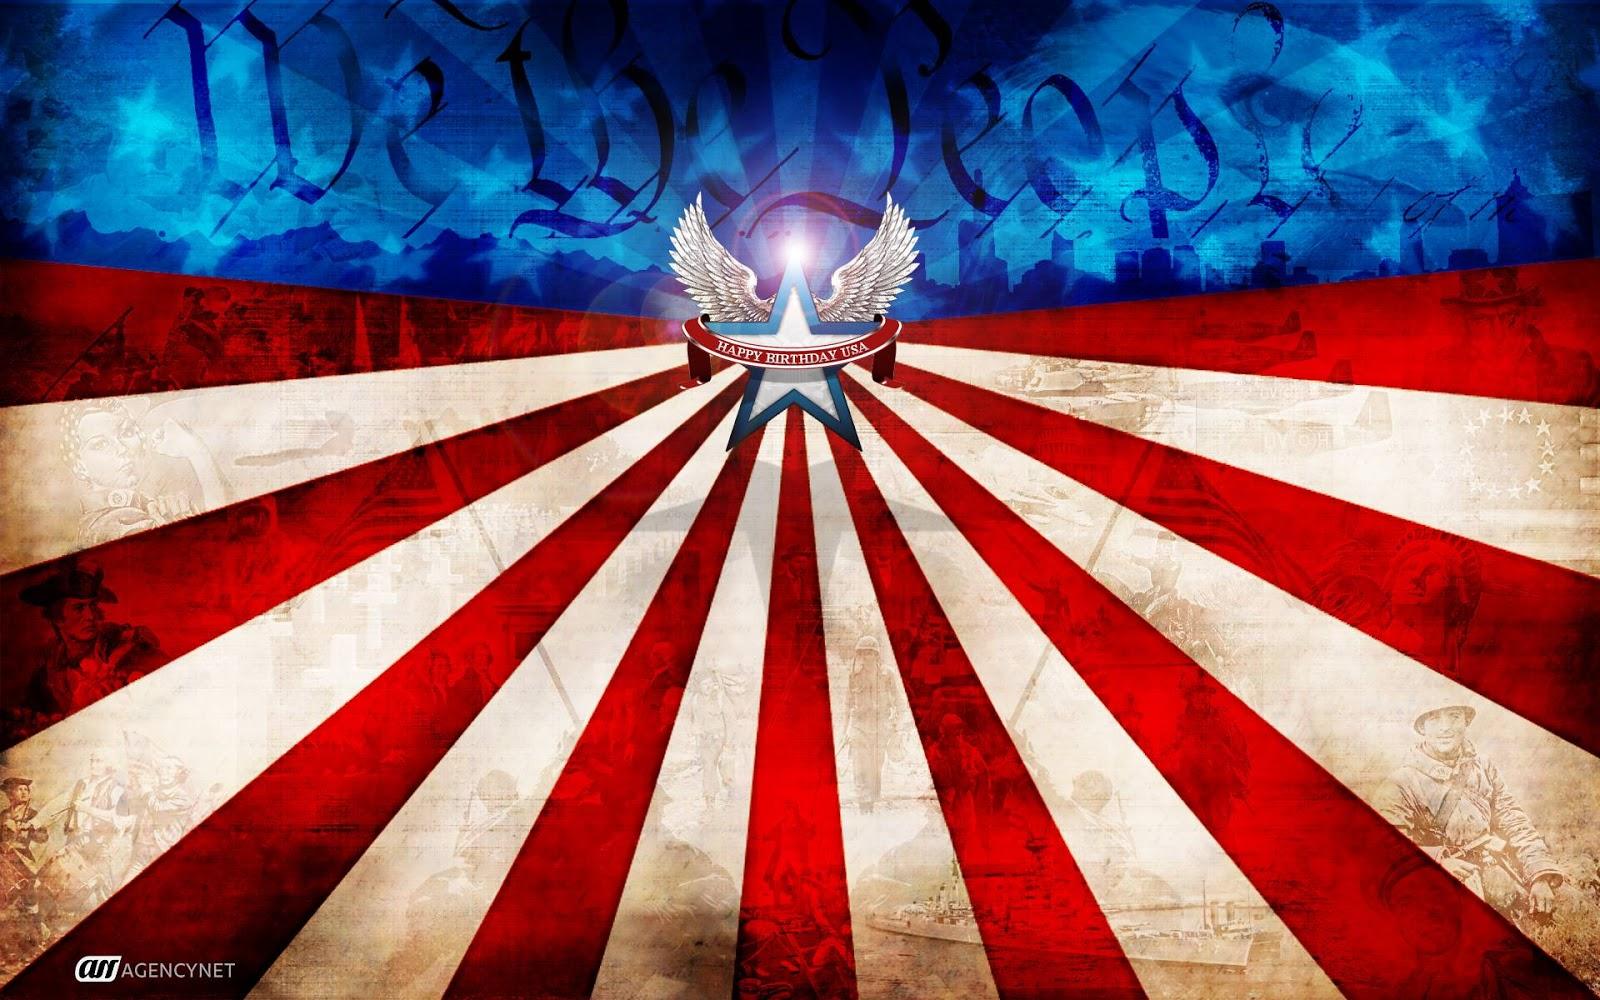 40 Patriotic Desktop 4th of July Wallpapers,